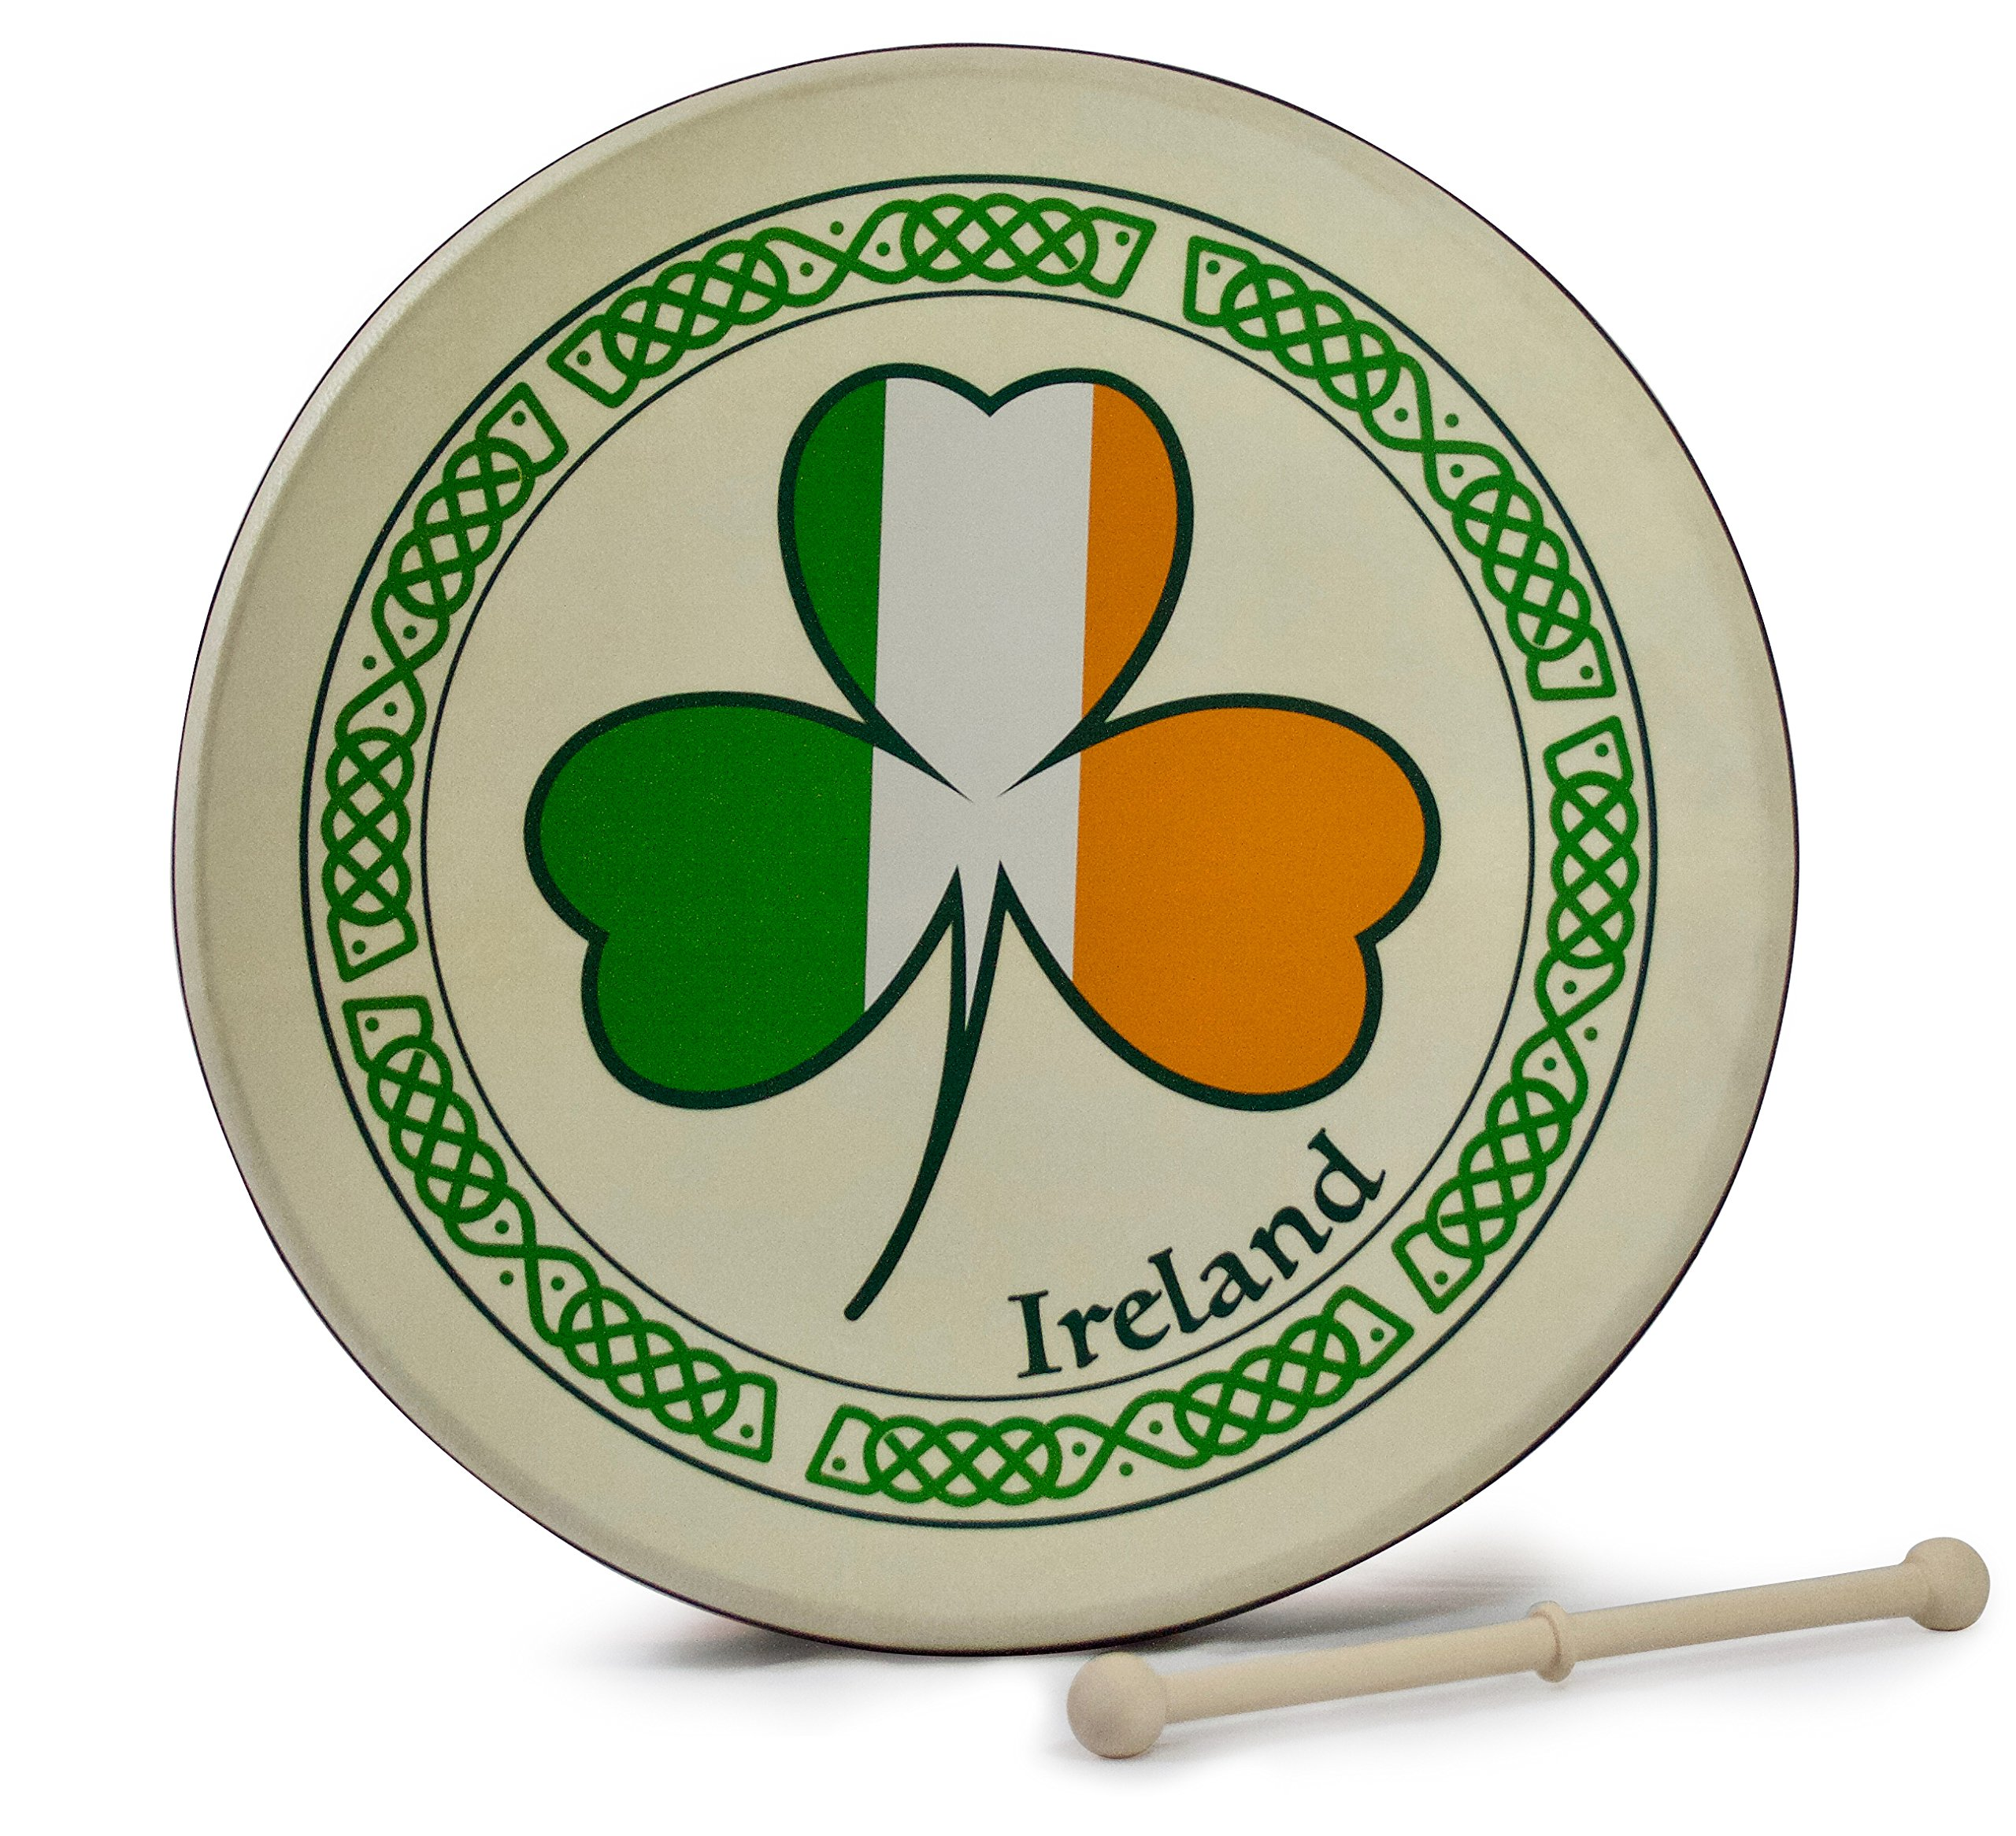 Waltons 15 Inch Tricolour Shamrock Bodhrán - Handcrafted Irish Instrument - Crisp & Musical Tone - Hardwood Beater Included w/Purchase